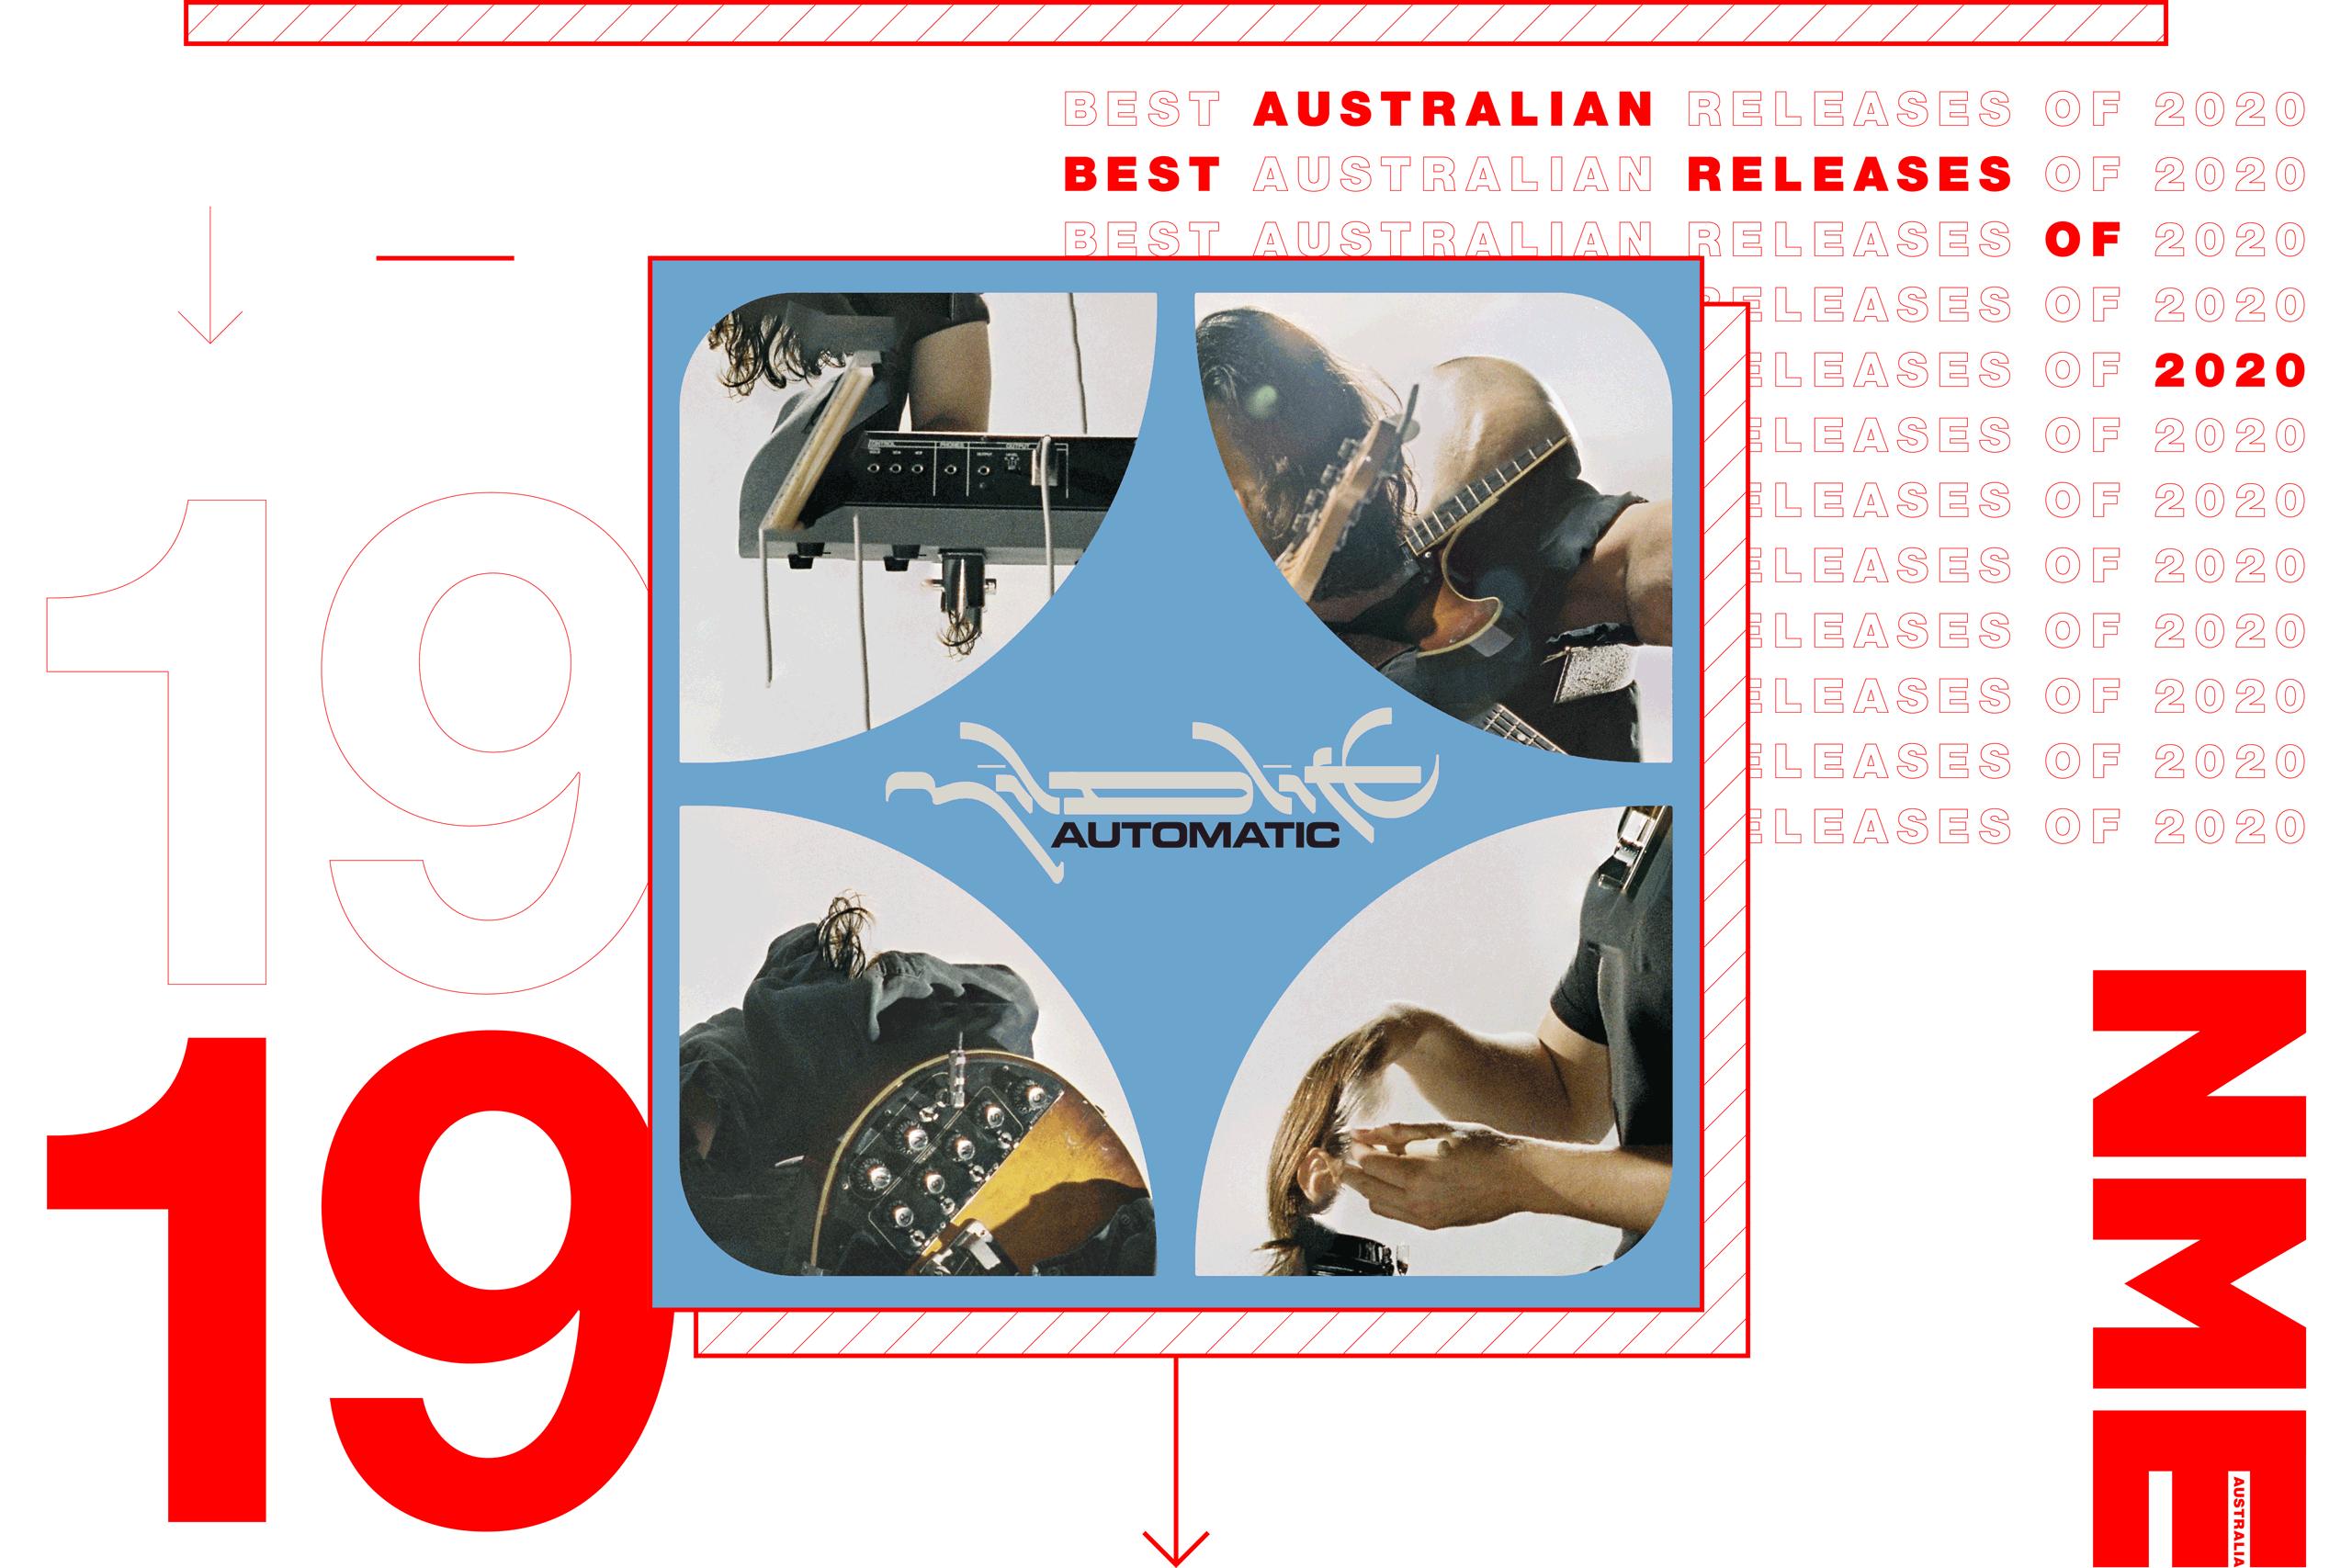 NME Australian Album Release 19